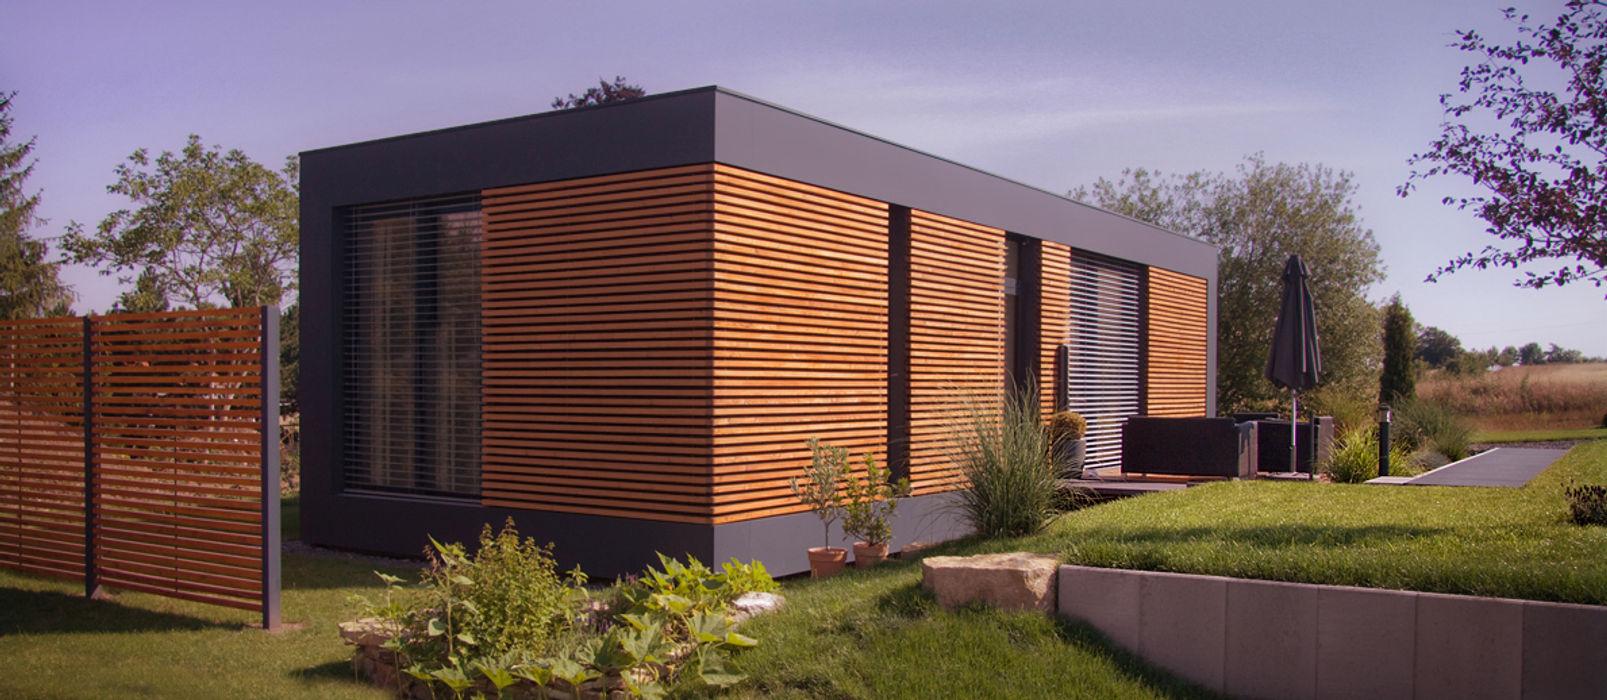 Musterhaus freelance smartshack Minimalistische Häuser